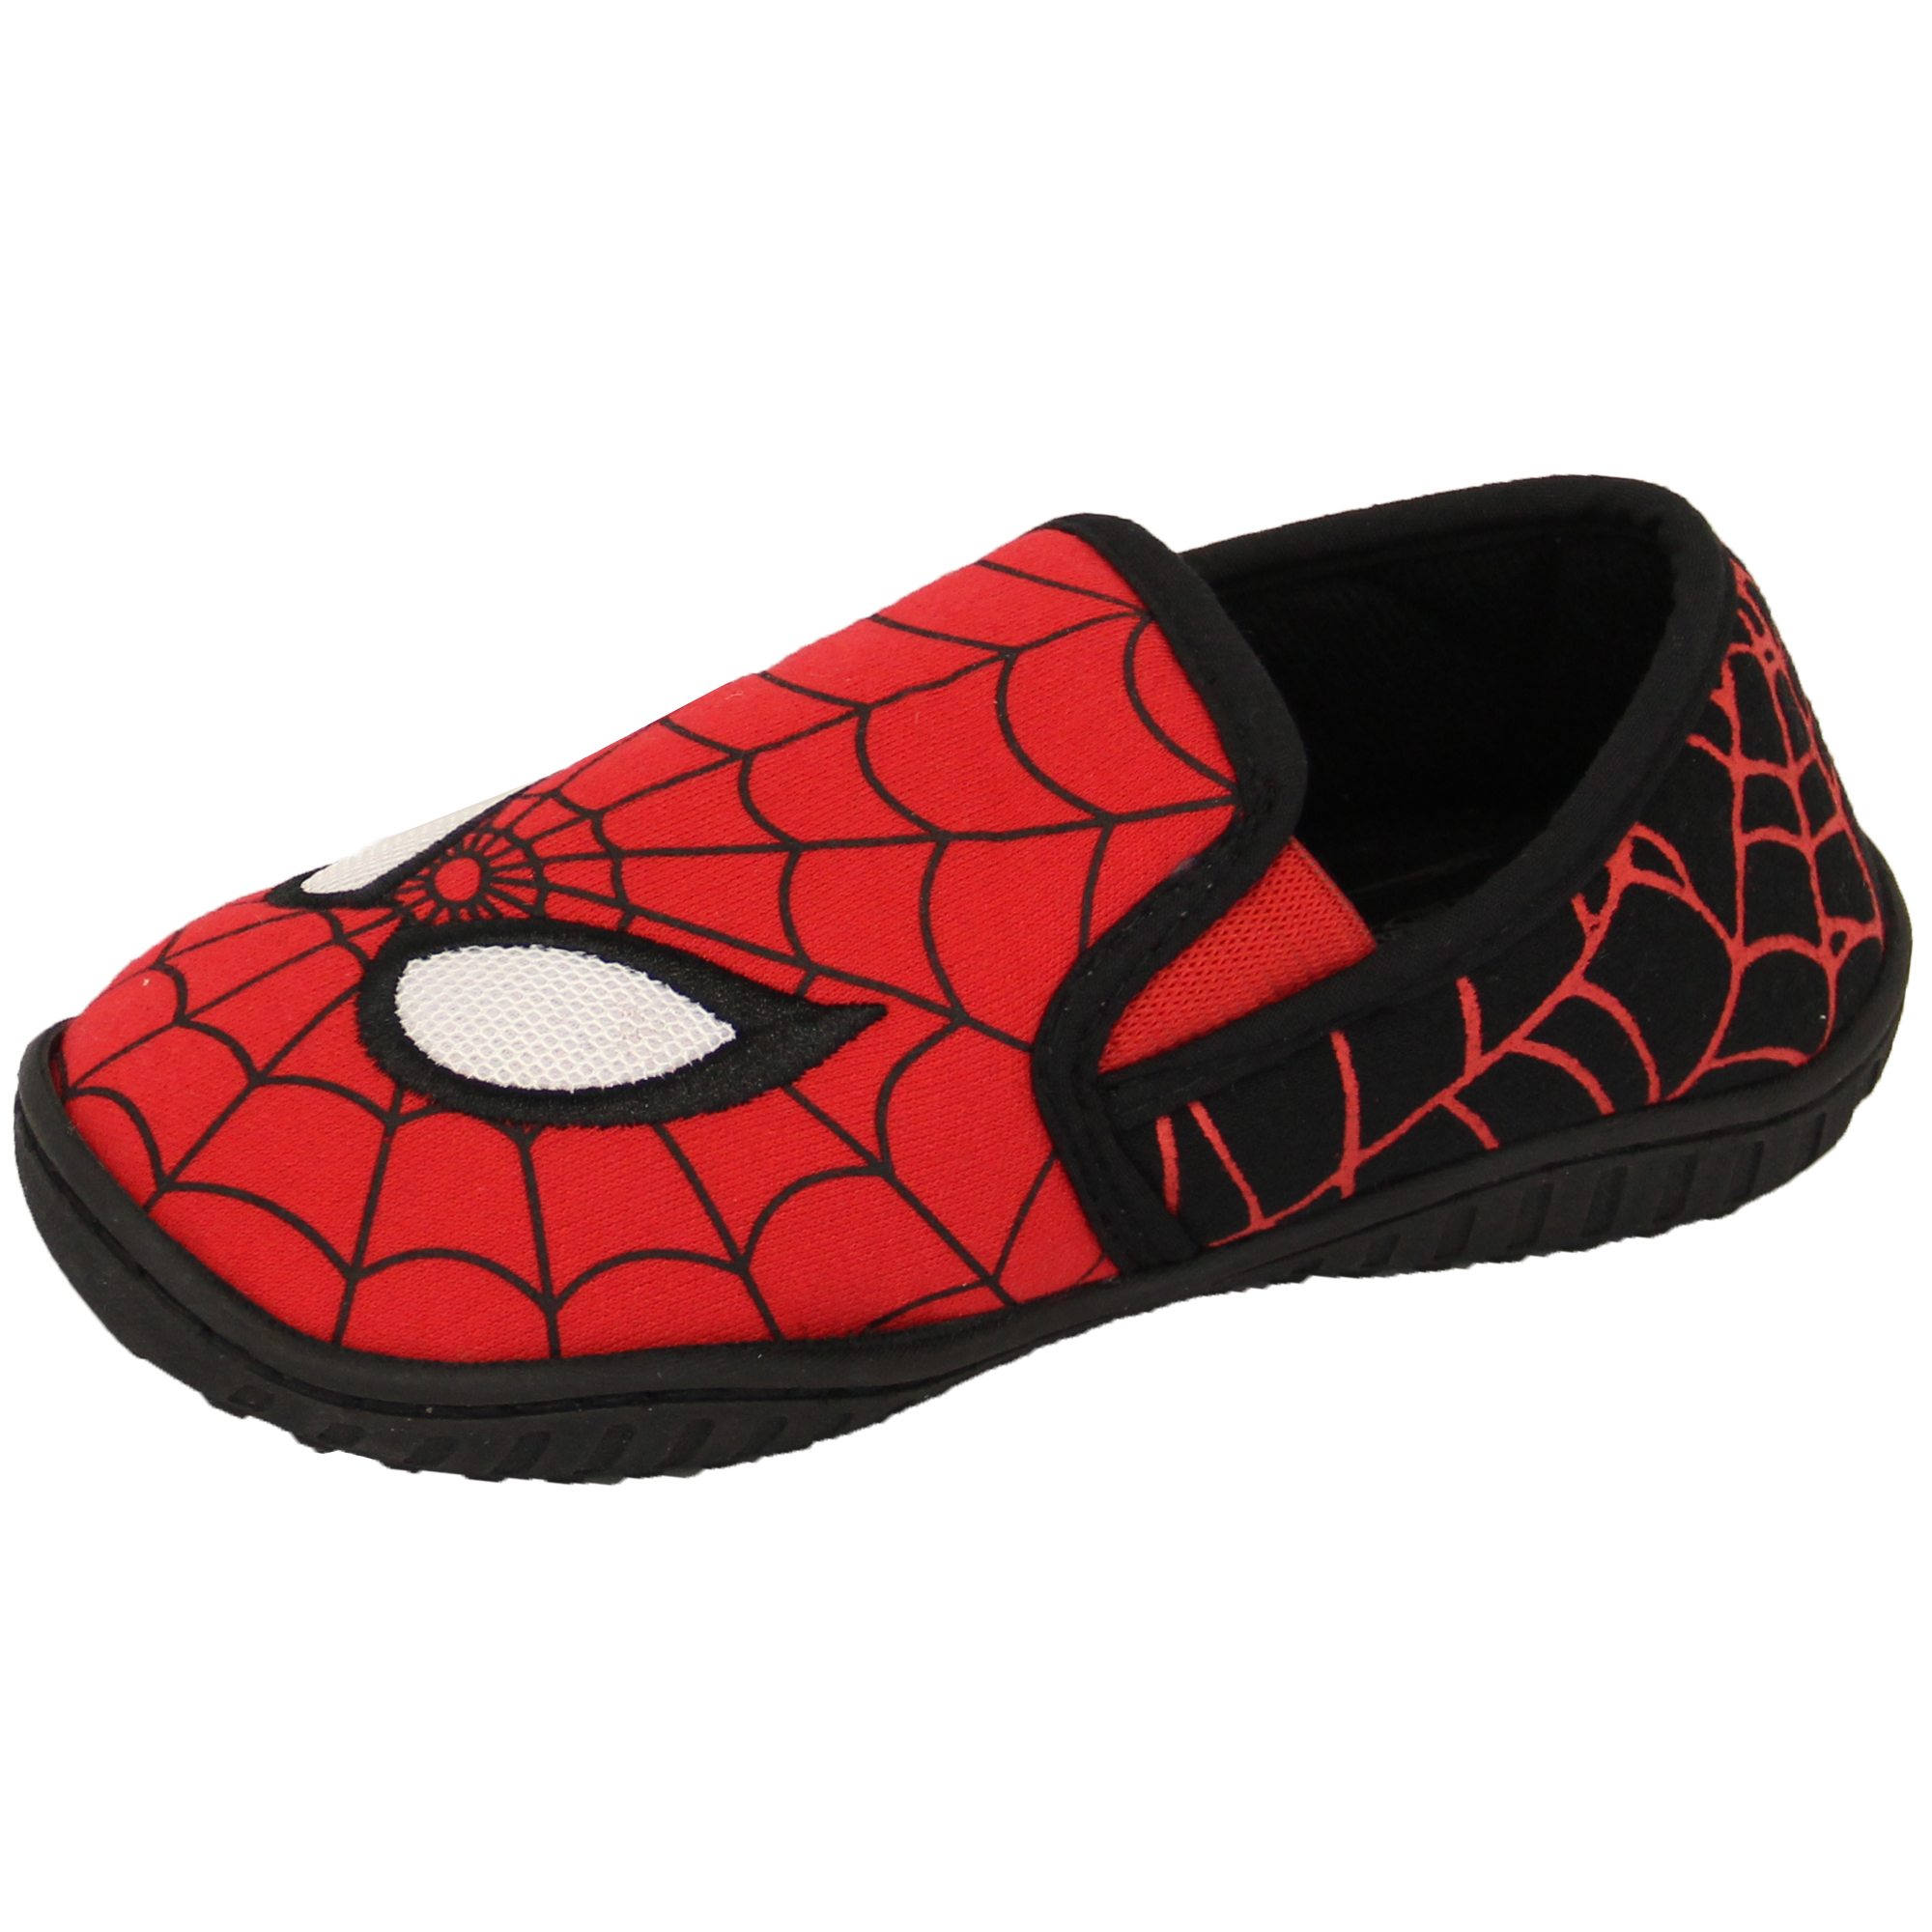 Boys-Girls-Shoes-Minion-Kids-Trainers-Star-Wars-Disney-Spiderman-Slipper thumbnail 33